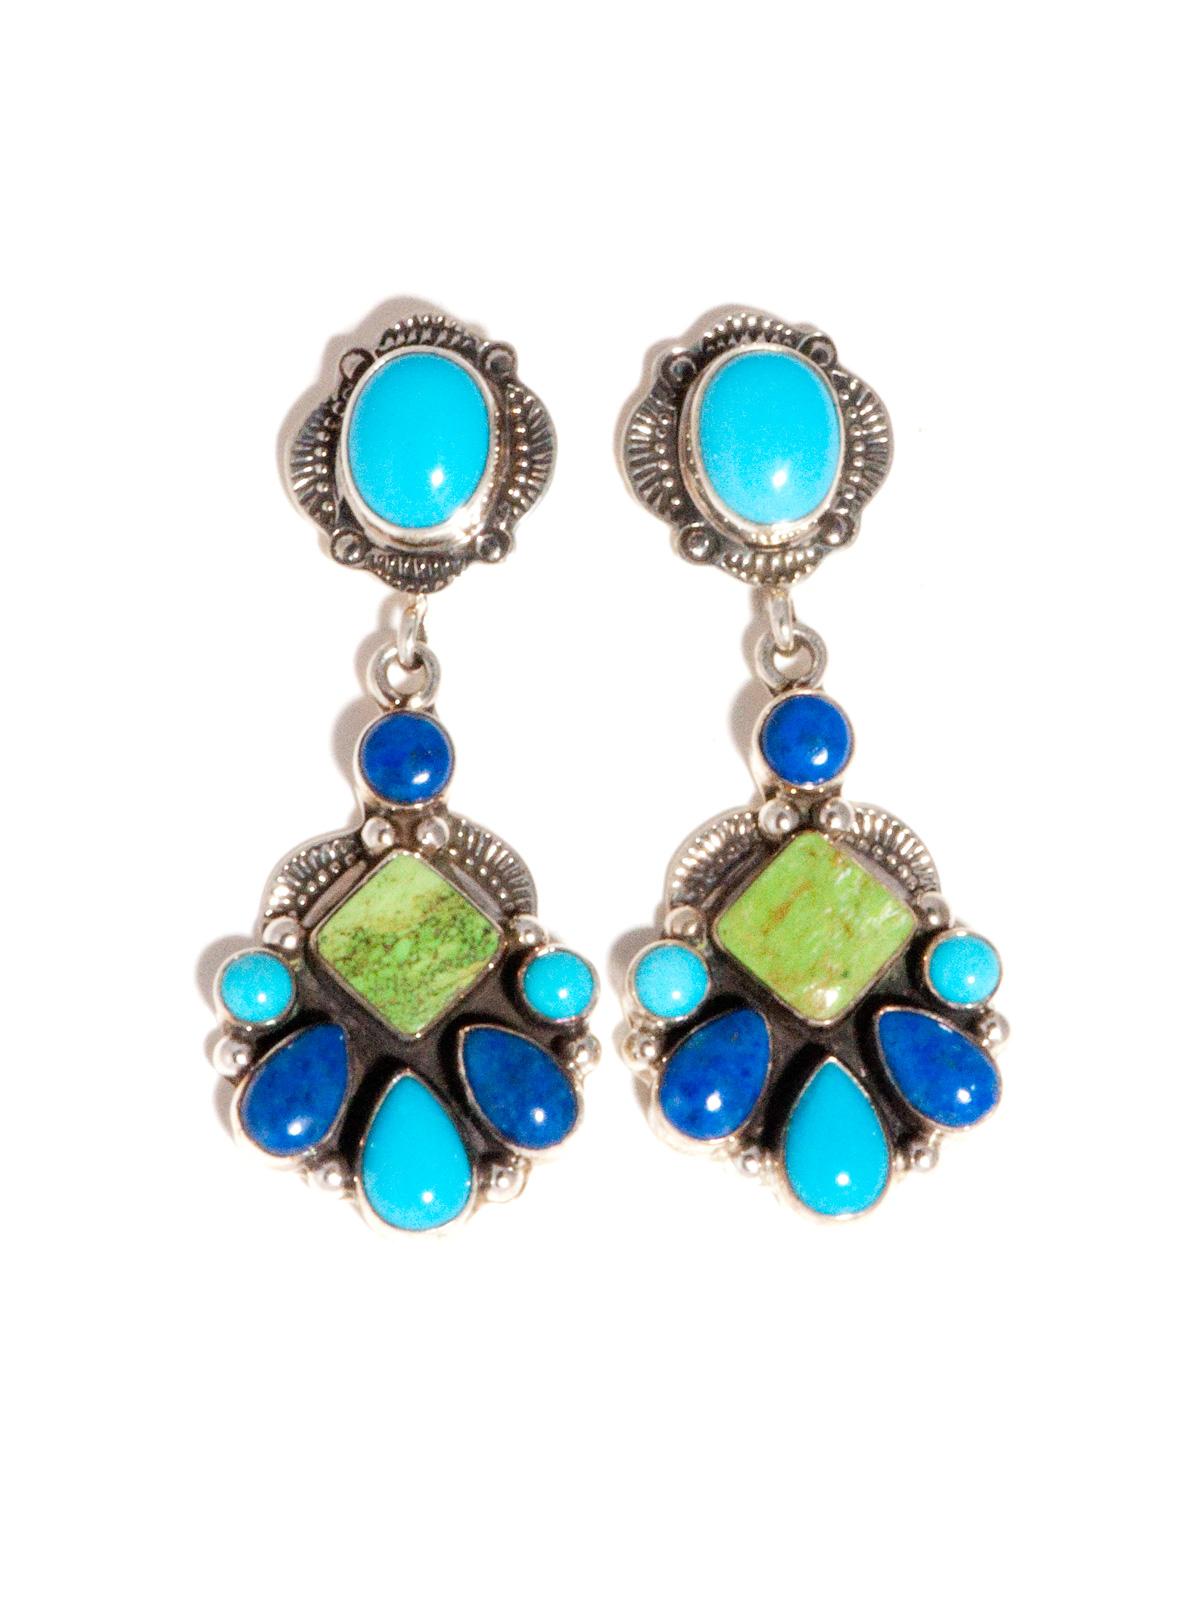 Dangle Earrings With Sleeping Beauty Turquoise, Lapis & Gaspeite